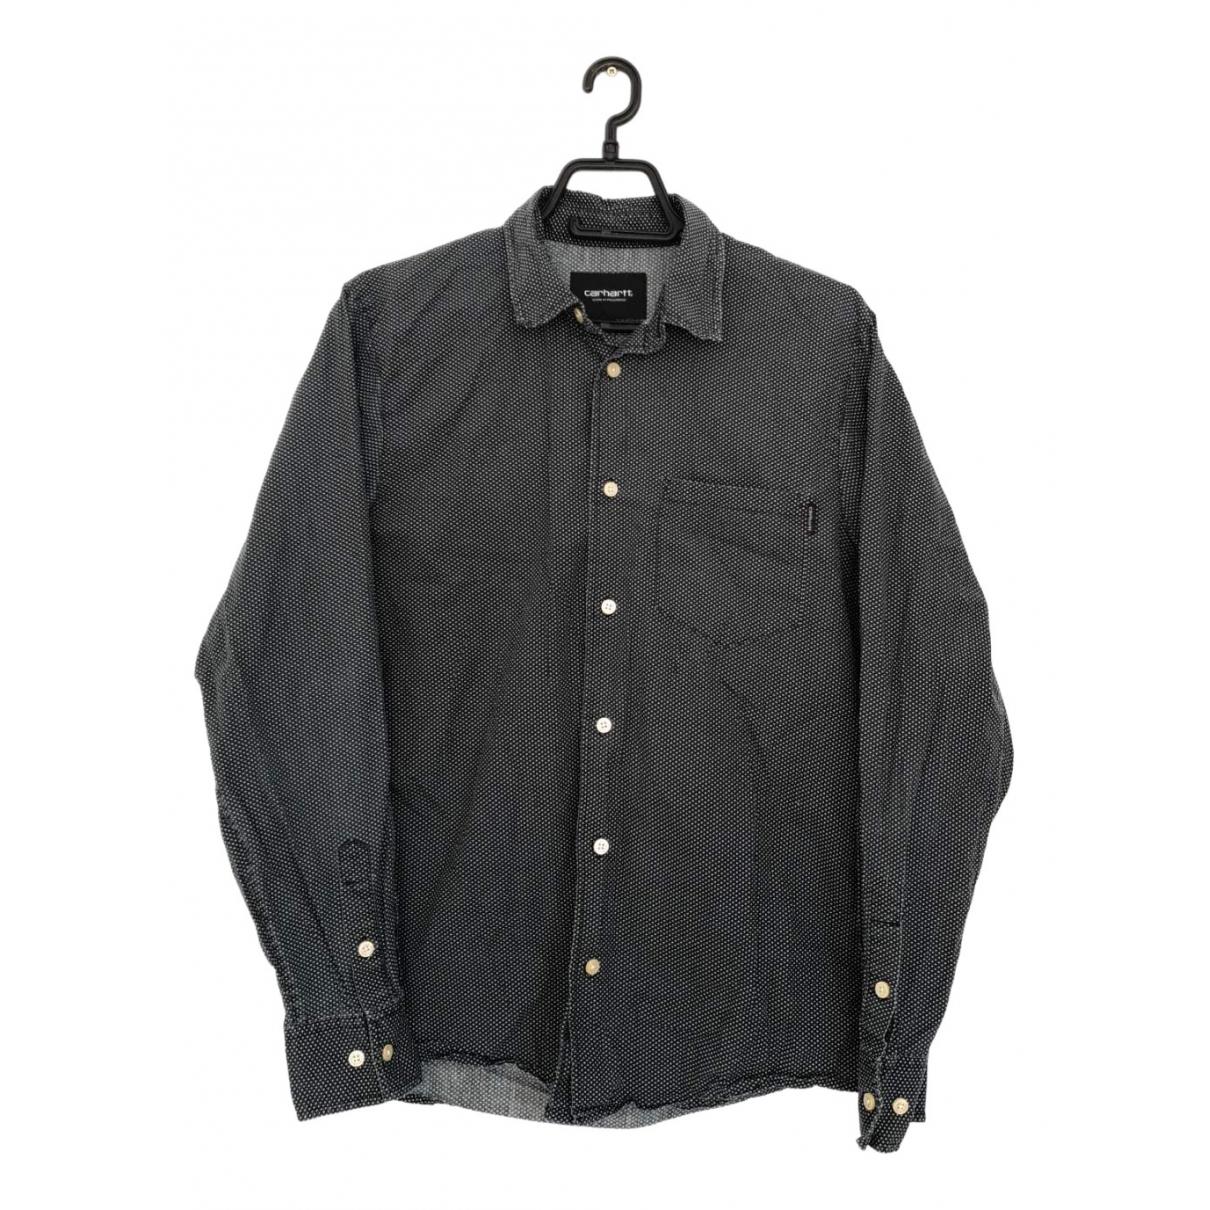 Carhartt Wip \N Black Cotton Shirts for Men M International